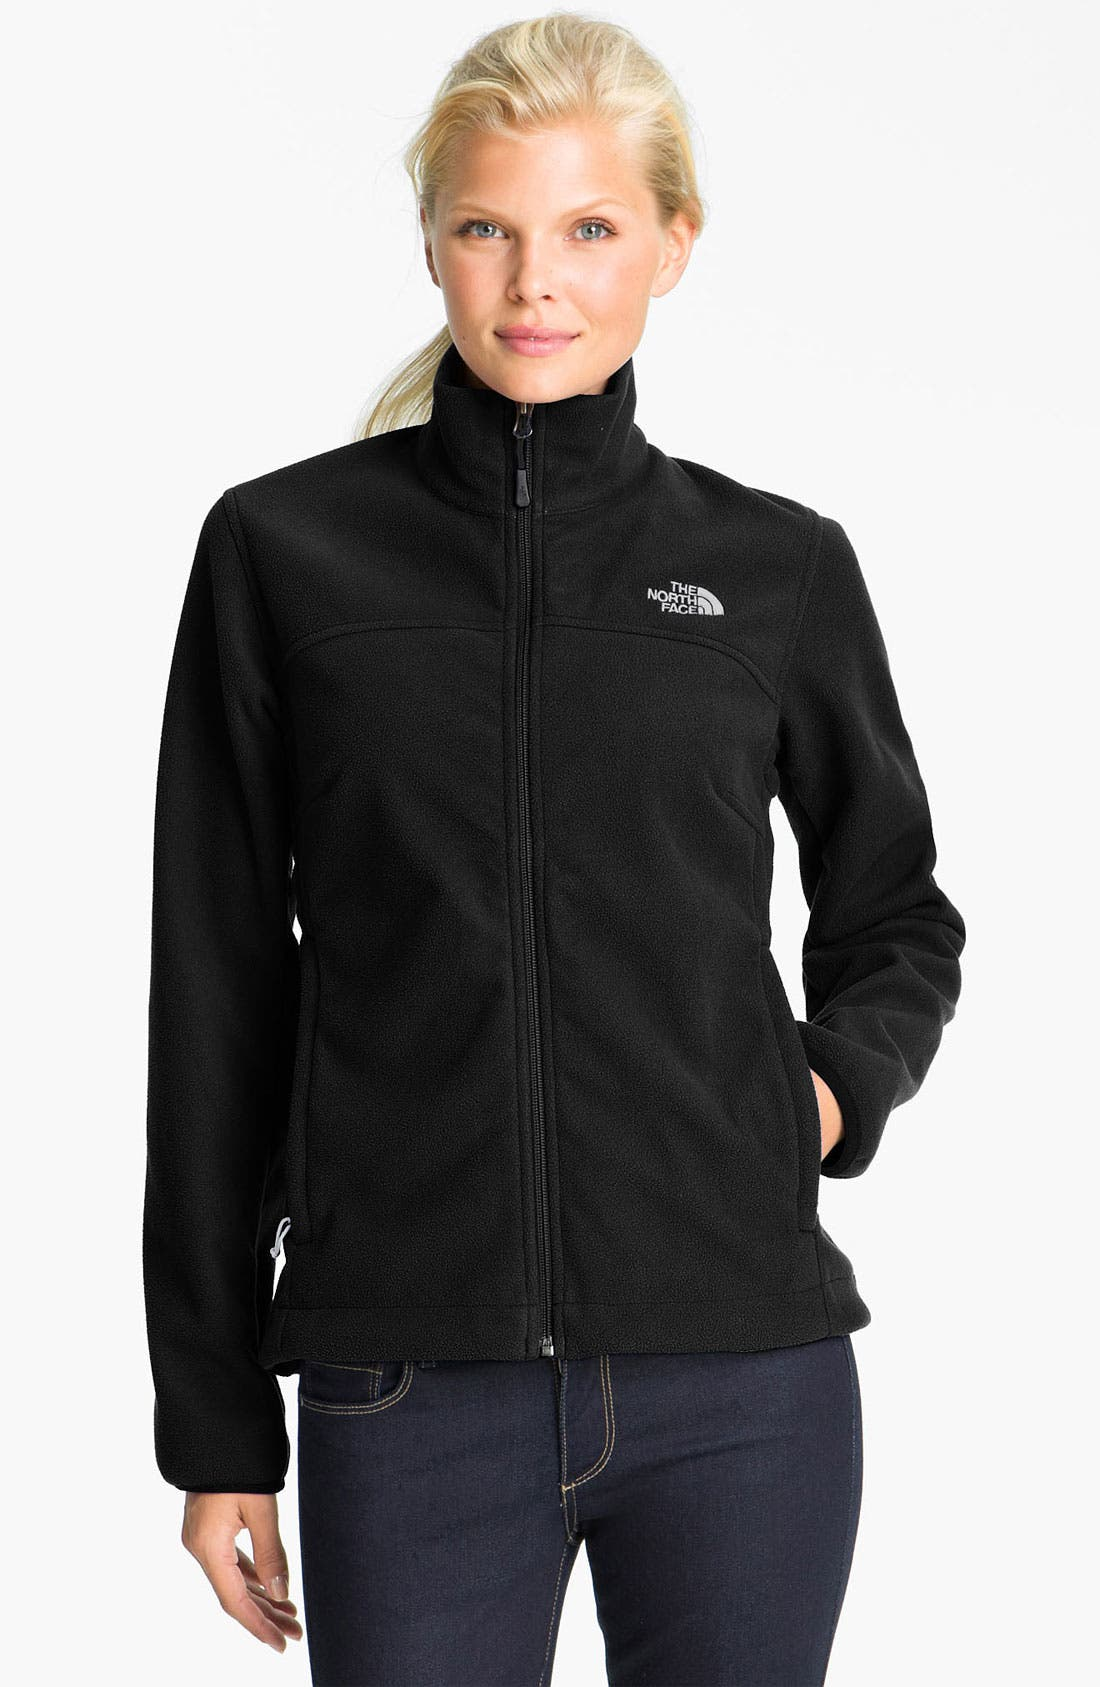 Main Image - The North Face 'Windwall' Jacket